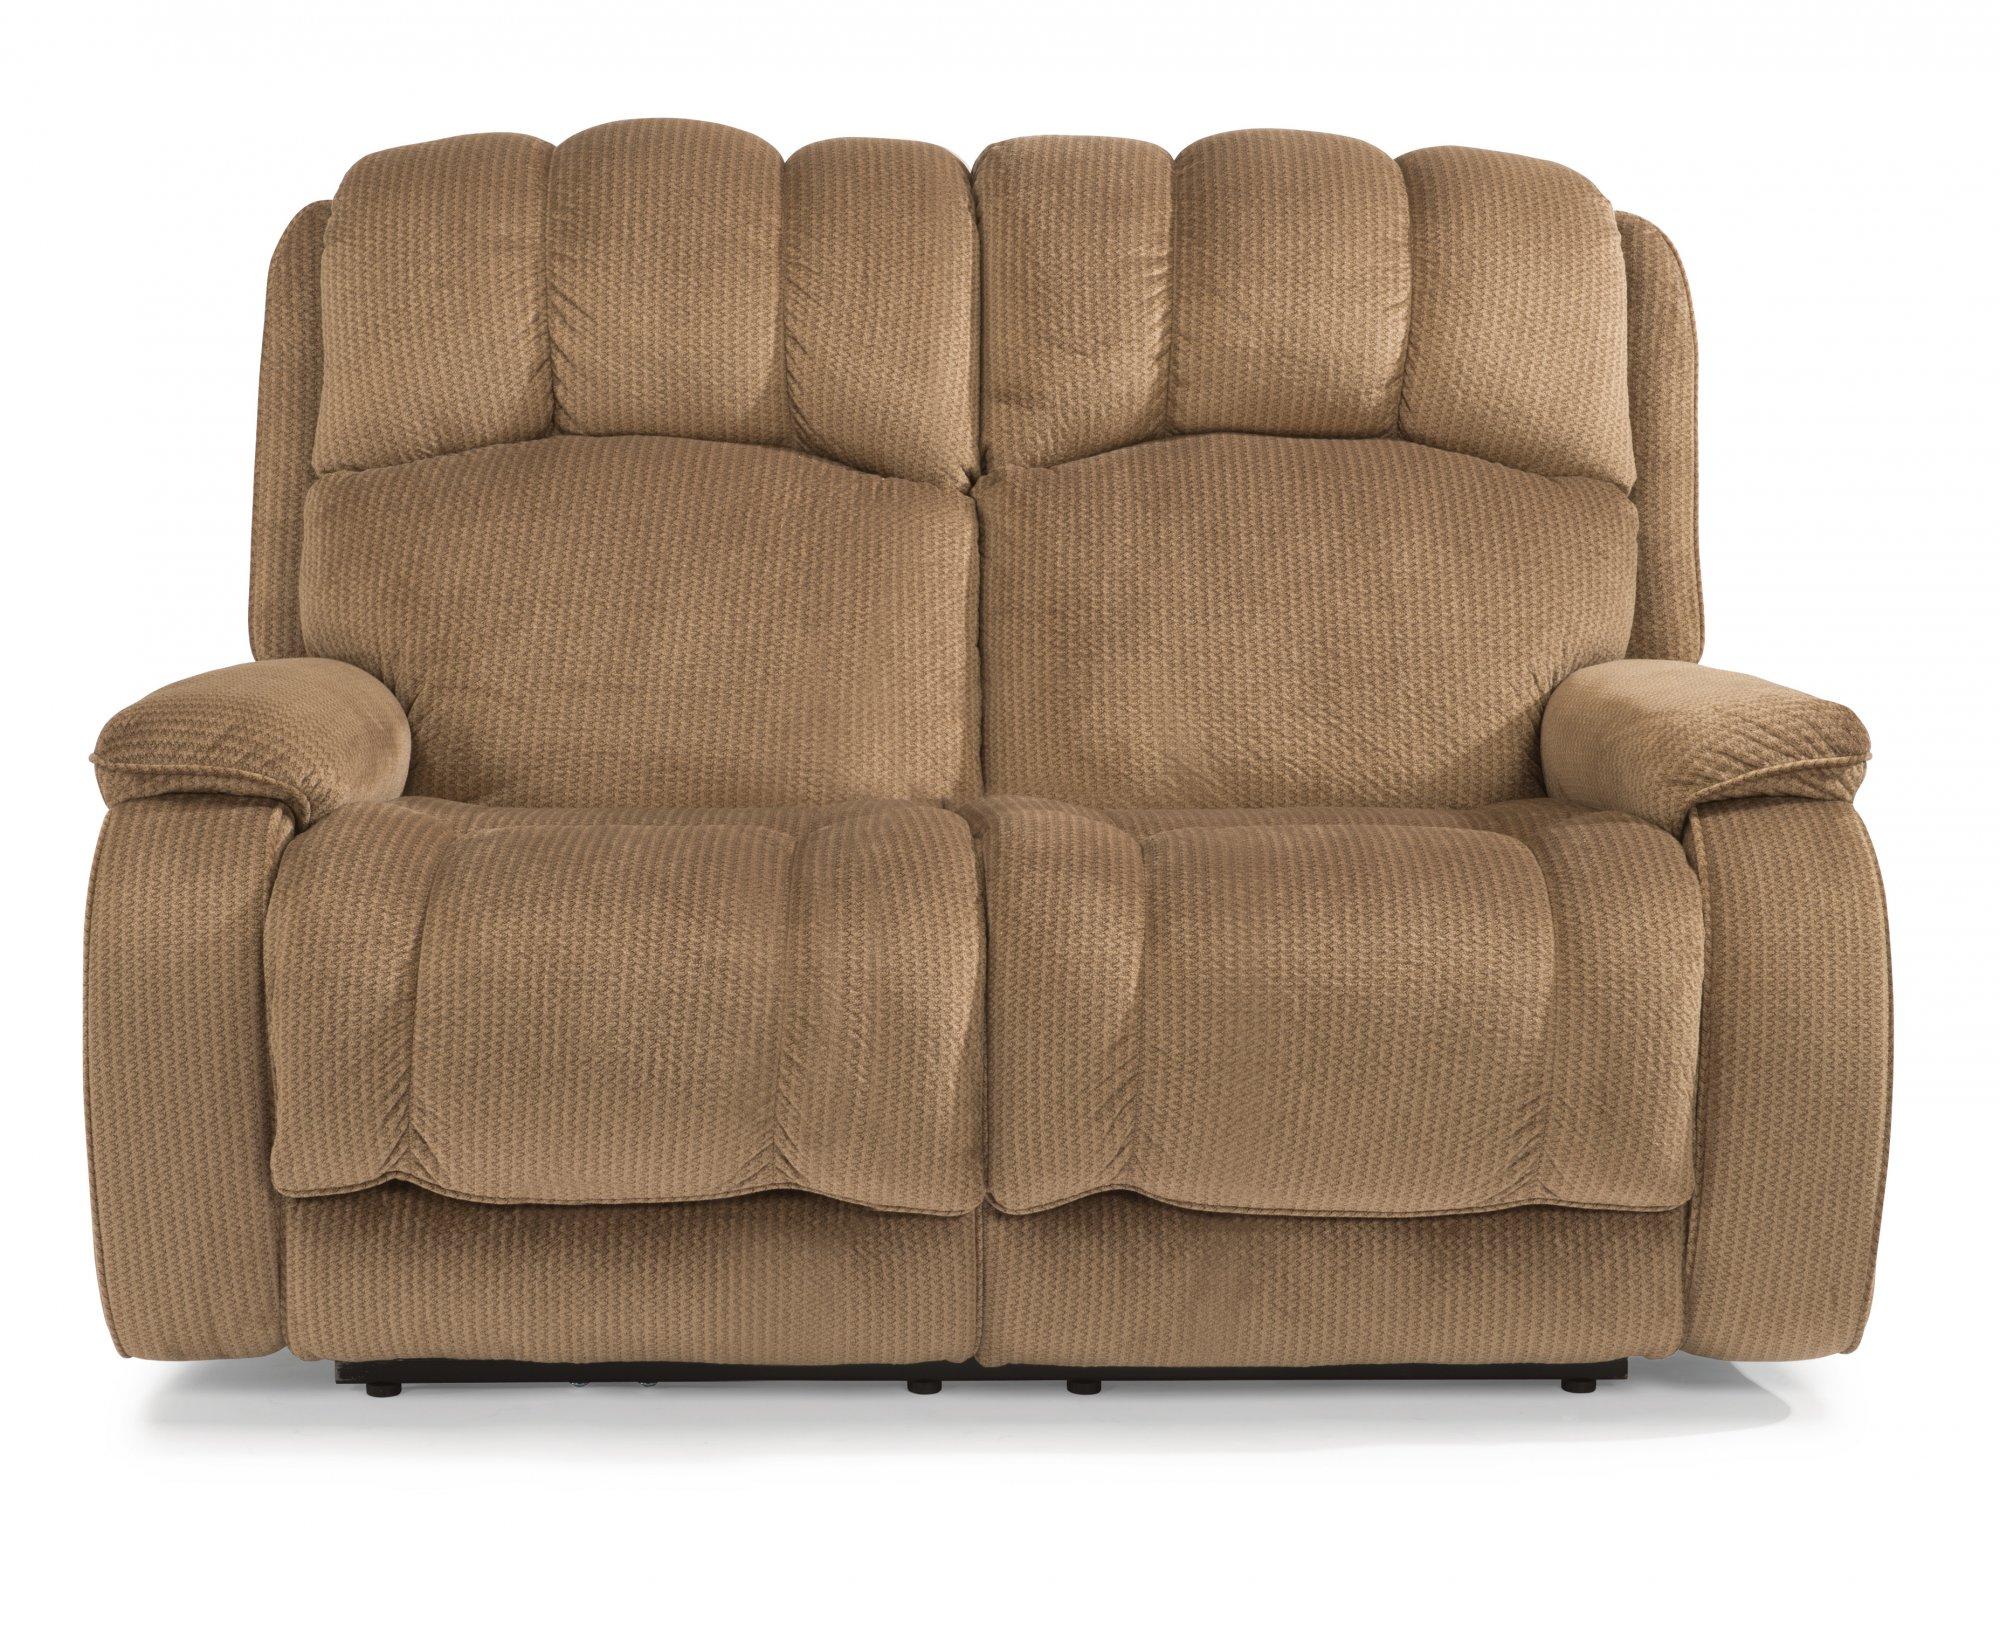 Stupendous Flexsteel 4841 60M Huron Fabric Power Reclining Loveseat Andrewgaddart Wooden Chair Designs For Living Room Andrewgaddartcom